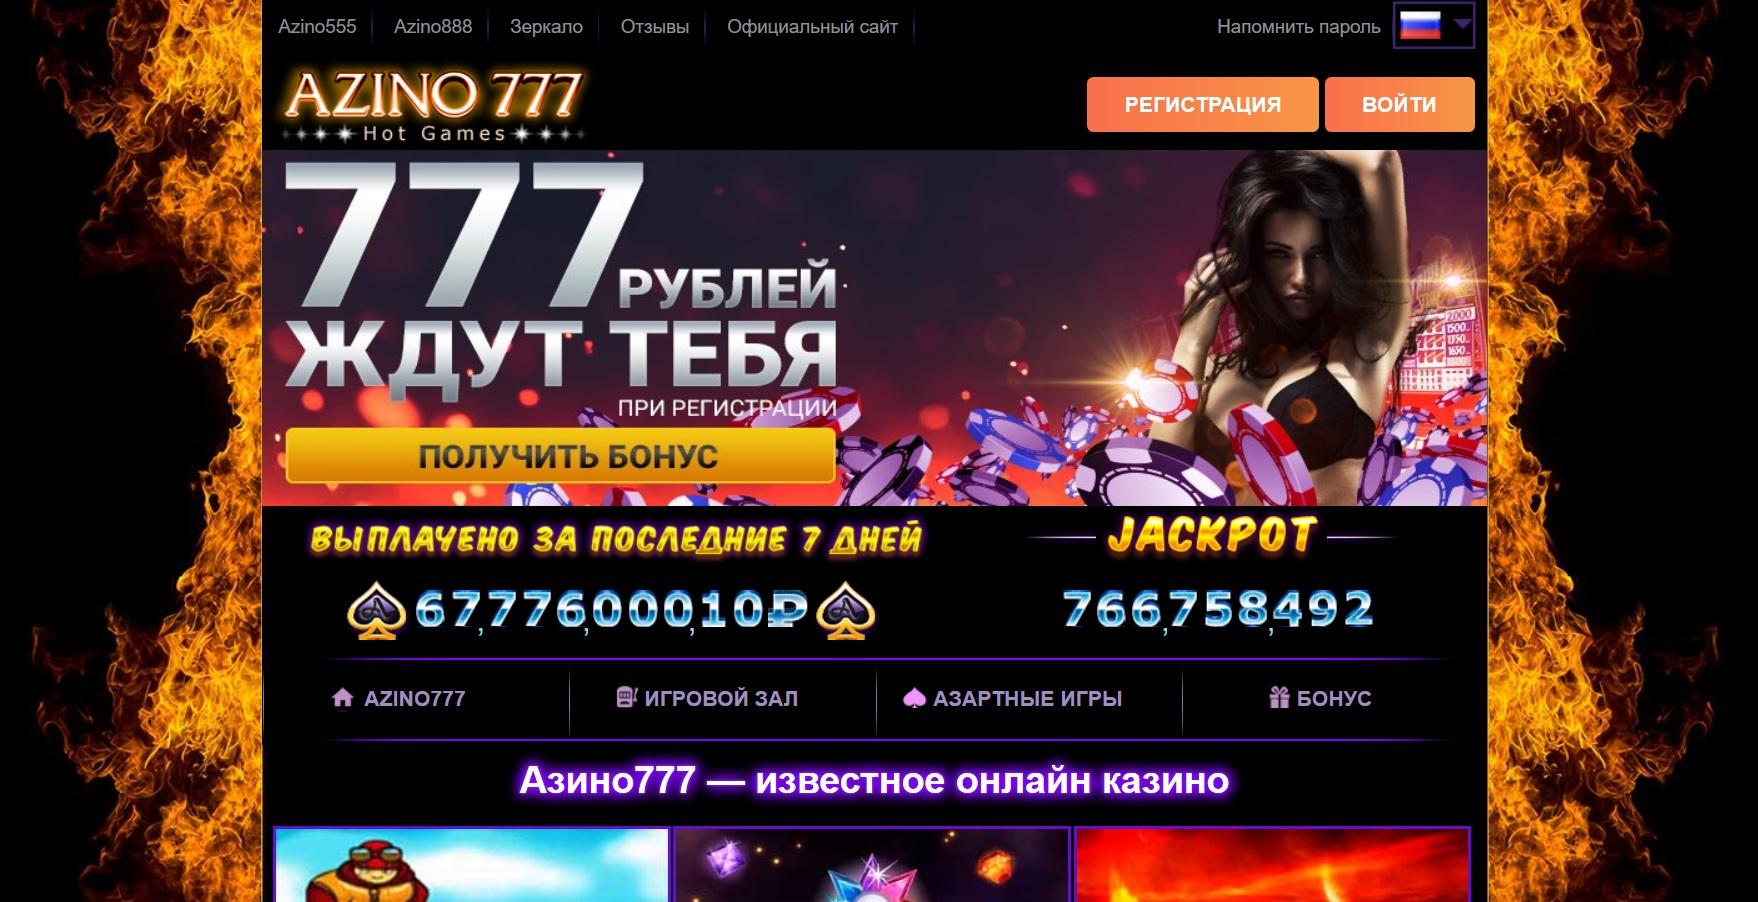 azino555 com bonus